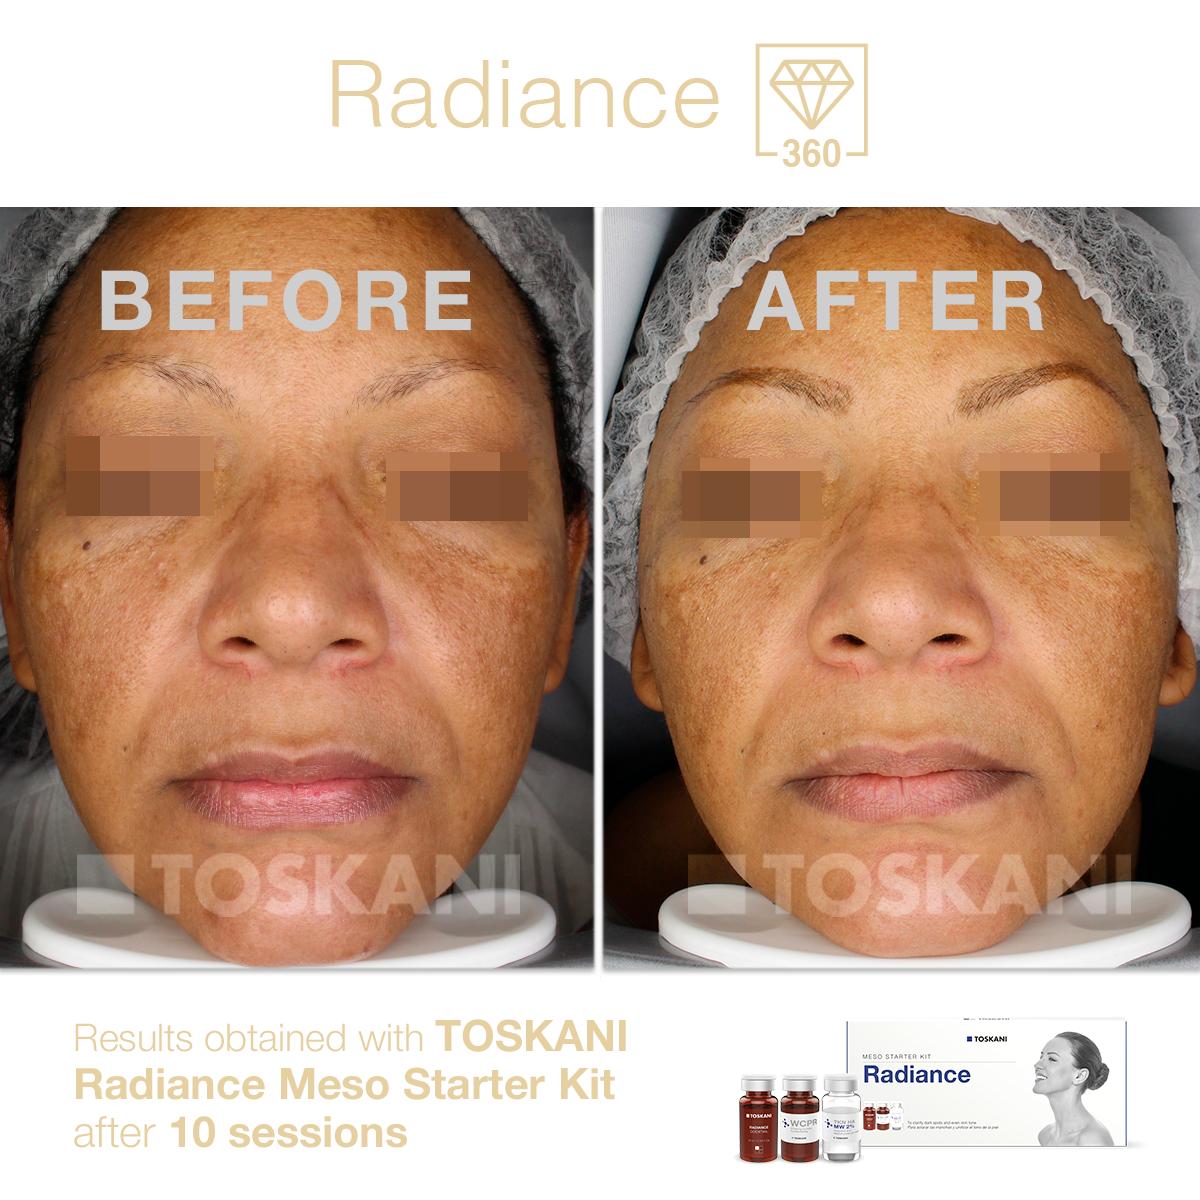 TKN_before-after_RadianceMesoStarterKit_10sessions